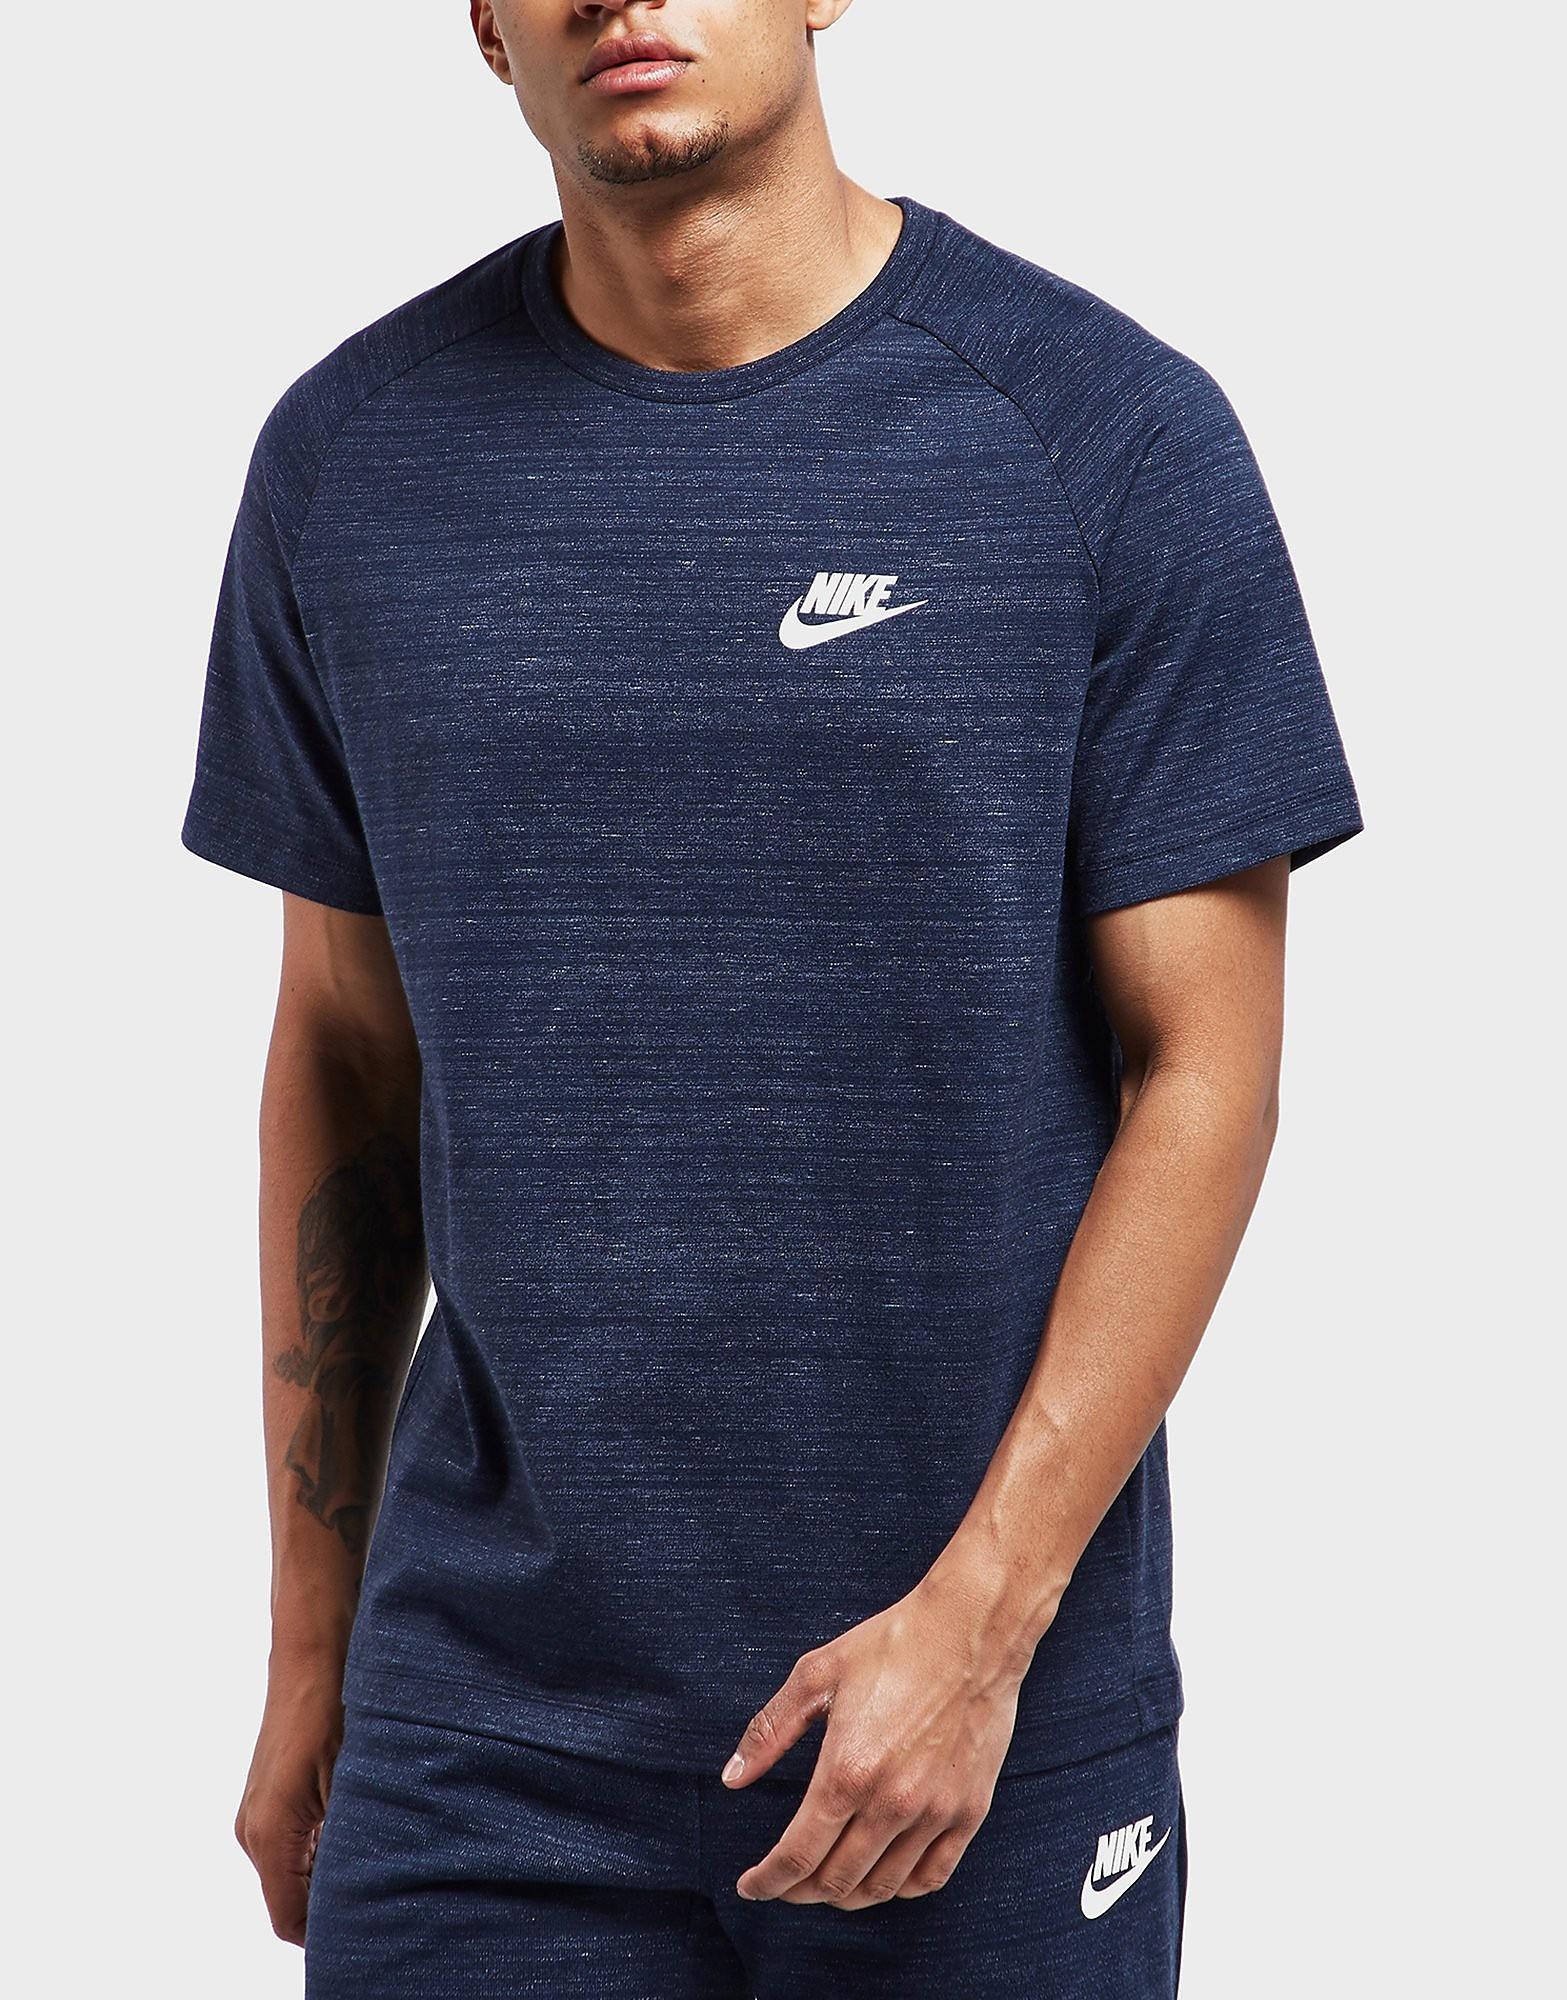 Nike Advance Knit Short Sleeve T-Shirt